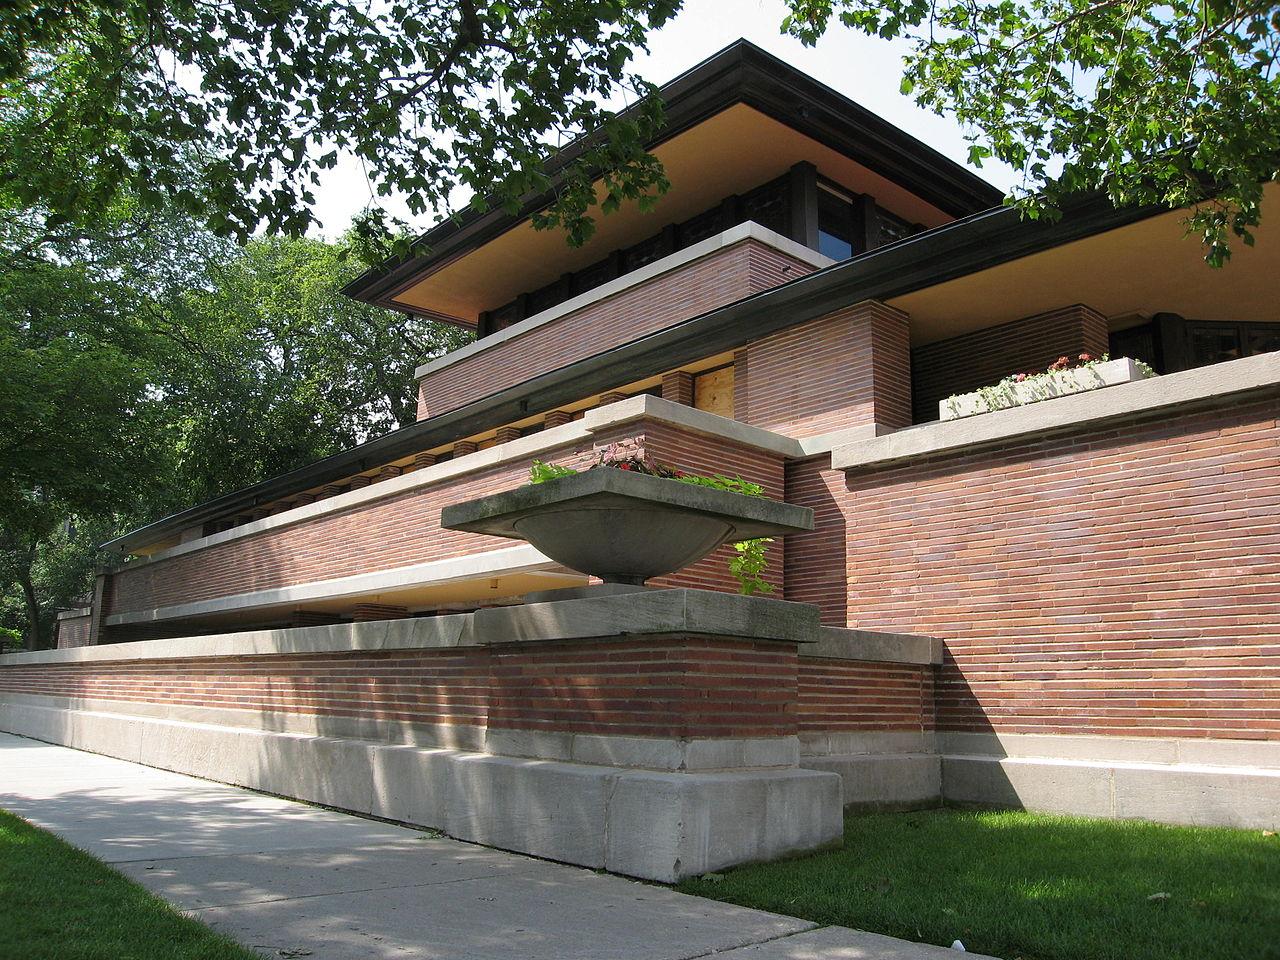 1280px-Robie_House_designed_by_Frank_Lloyd_Wright_1909.jpg